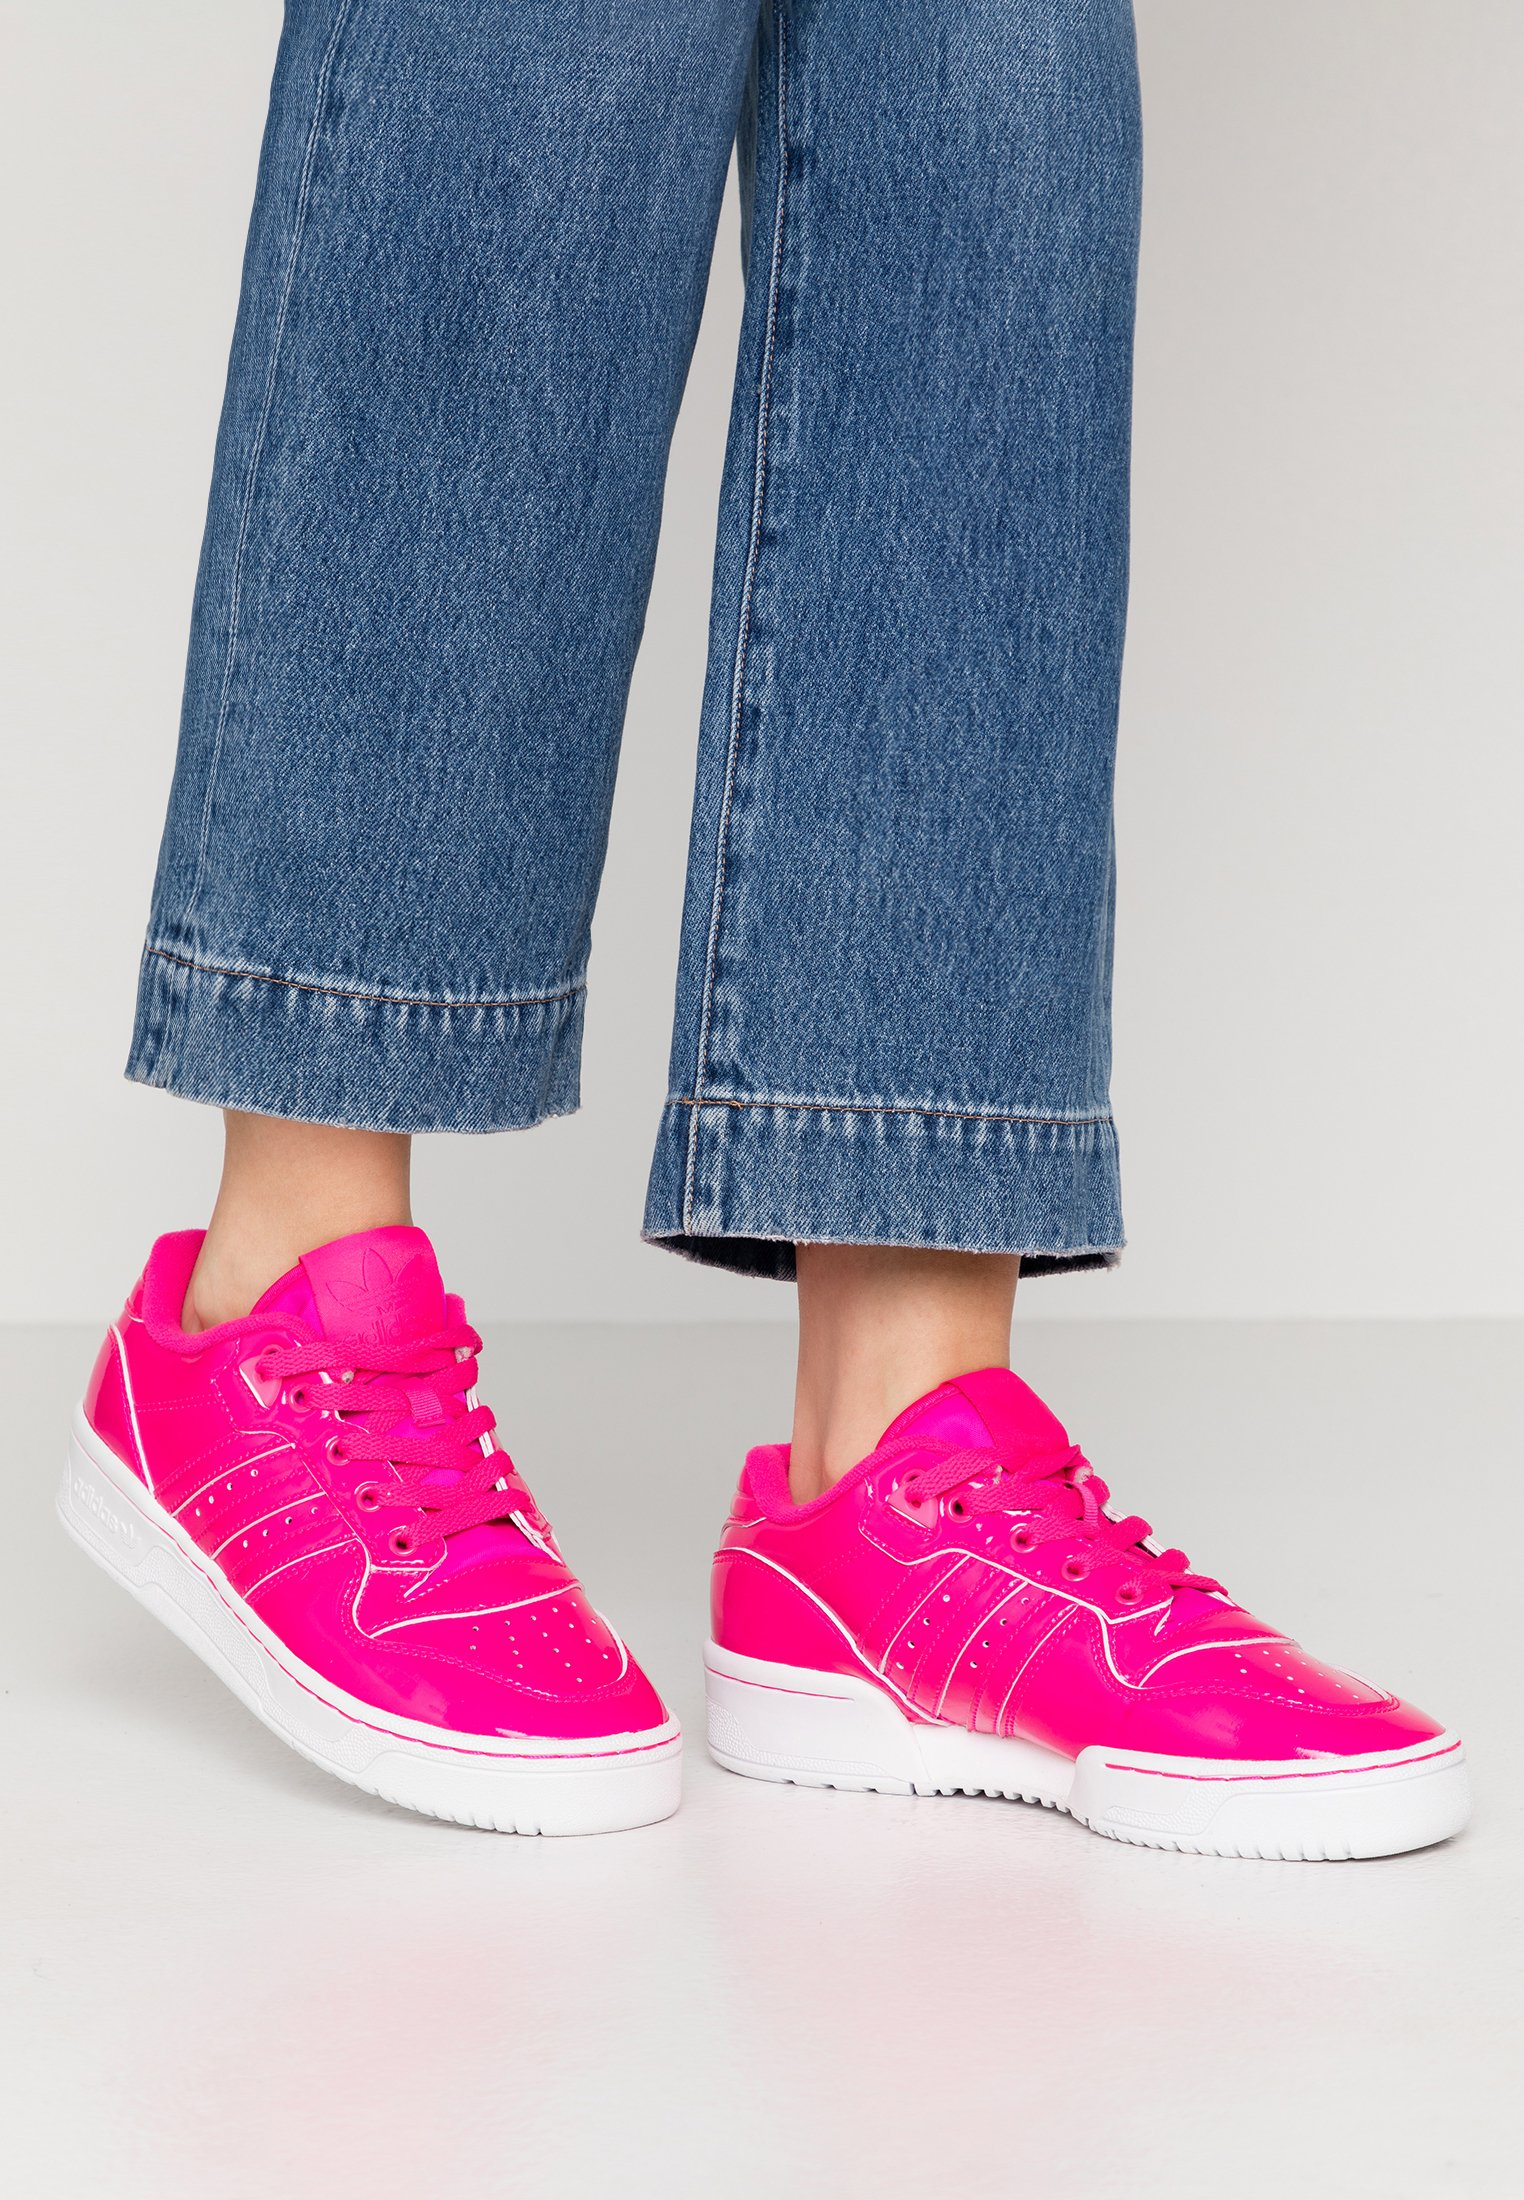 RIVALRY Sneakers shock pinkfootwear white